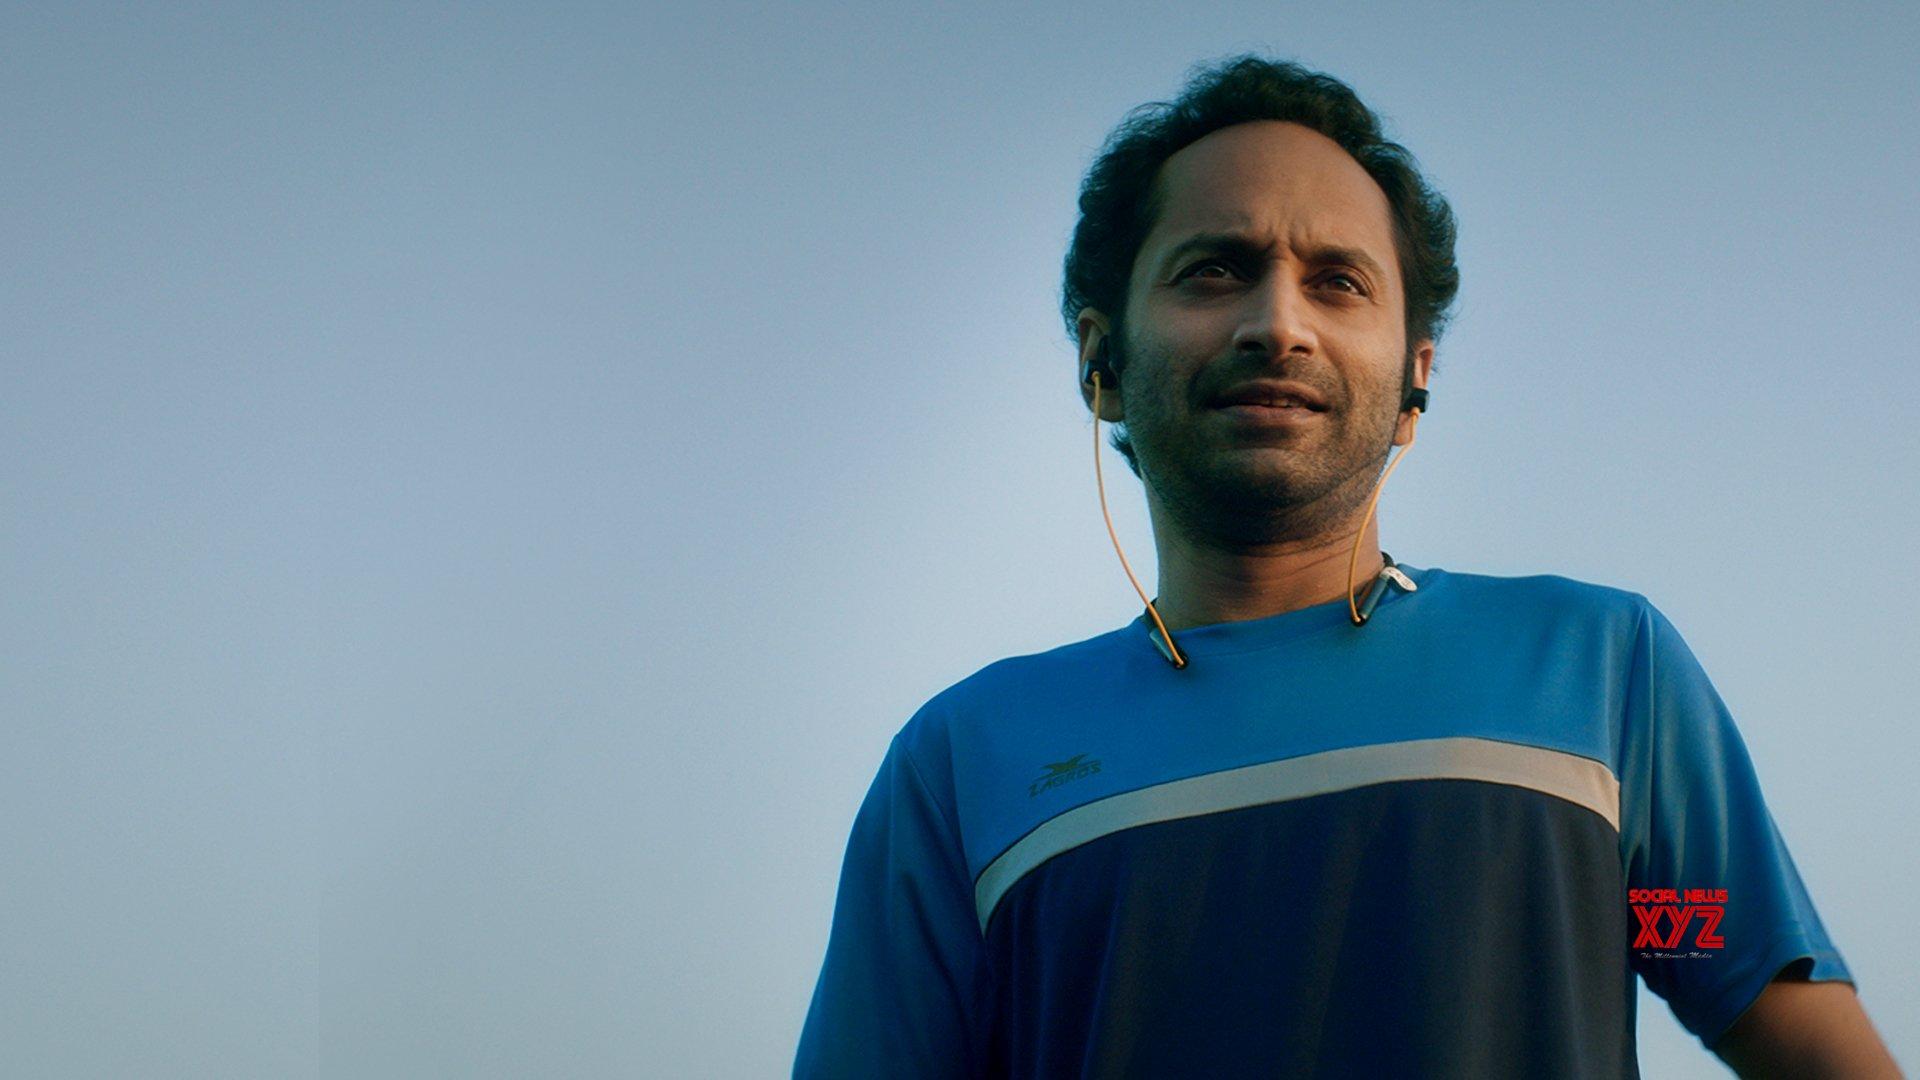 Fahadh Faasil's Joji movie is now streaming on Amazon Prime Video